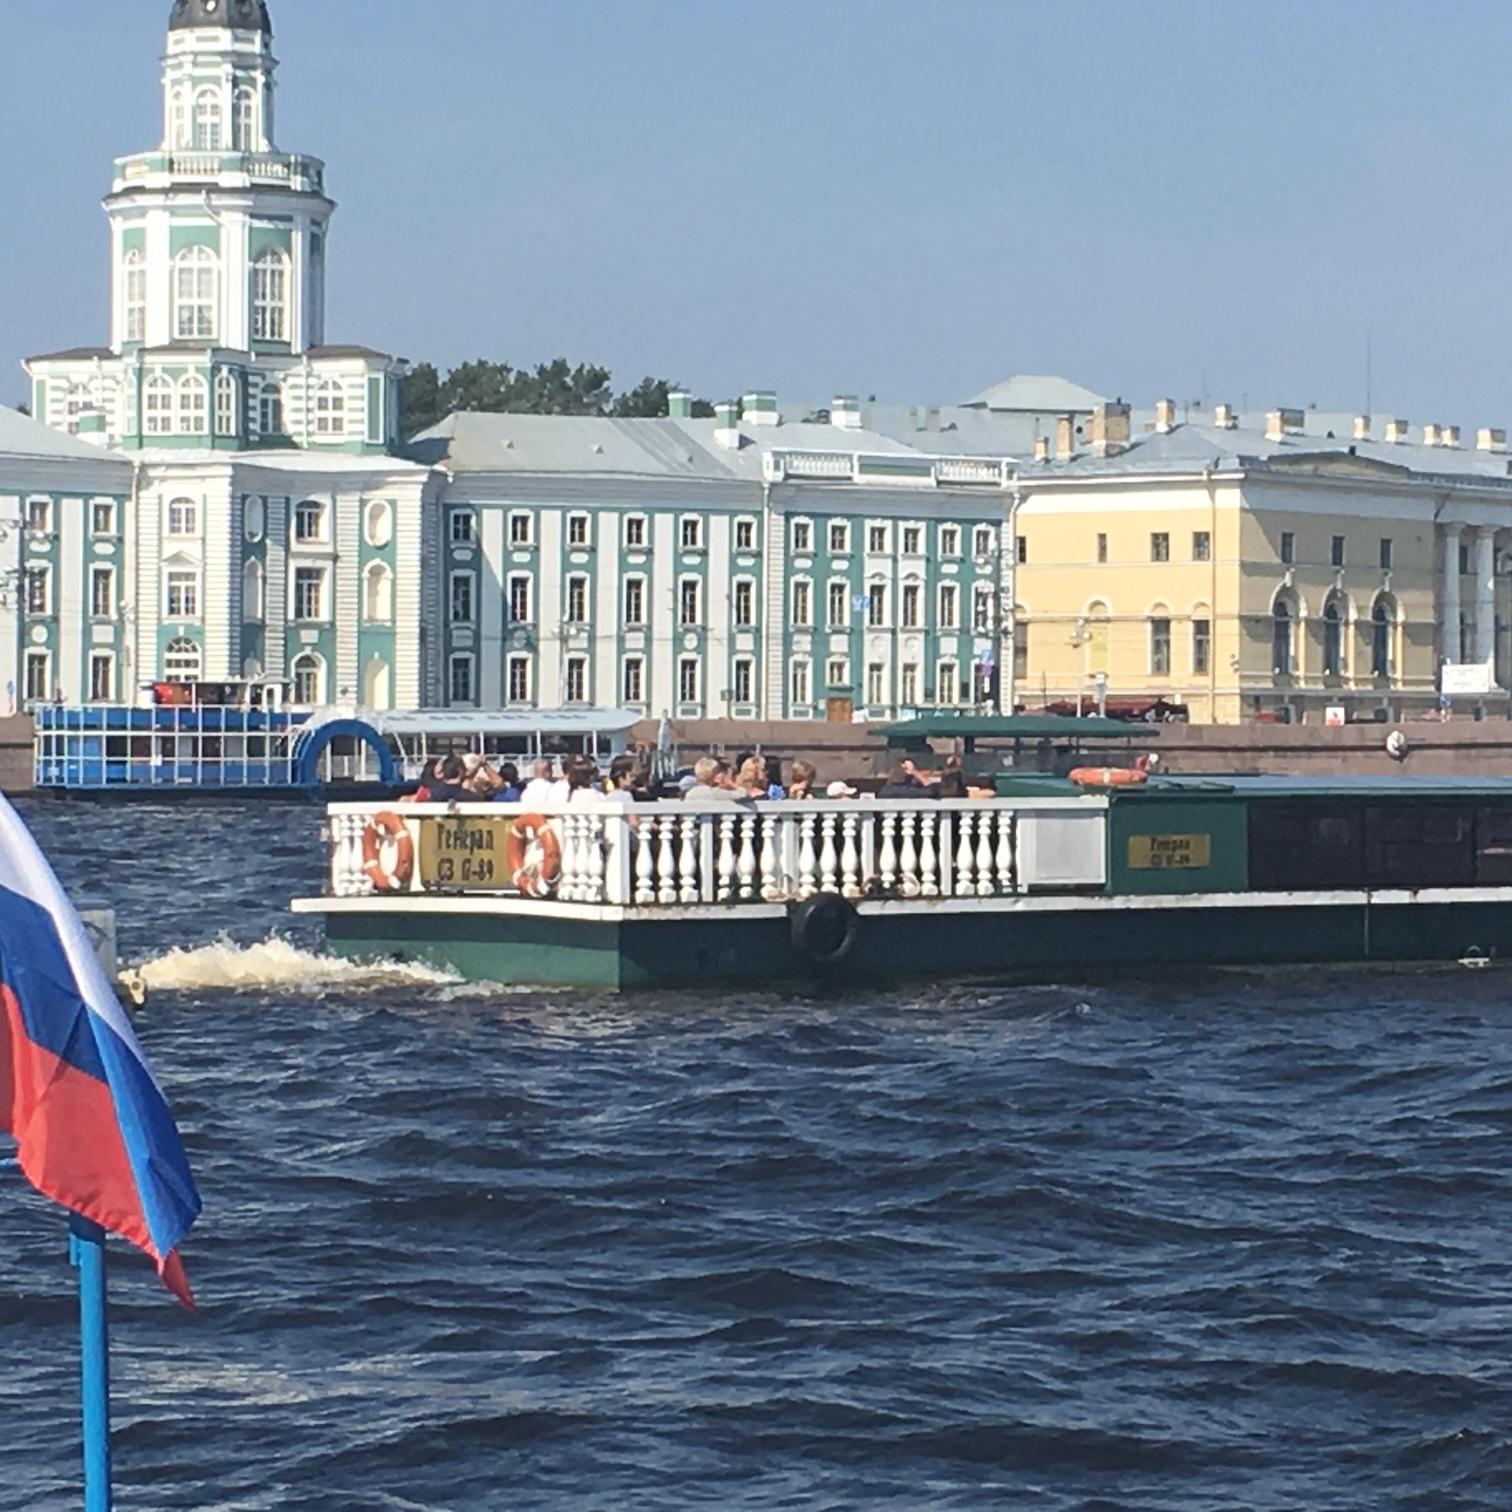 Neva River, St Petersburg by The Doubtful Traveller